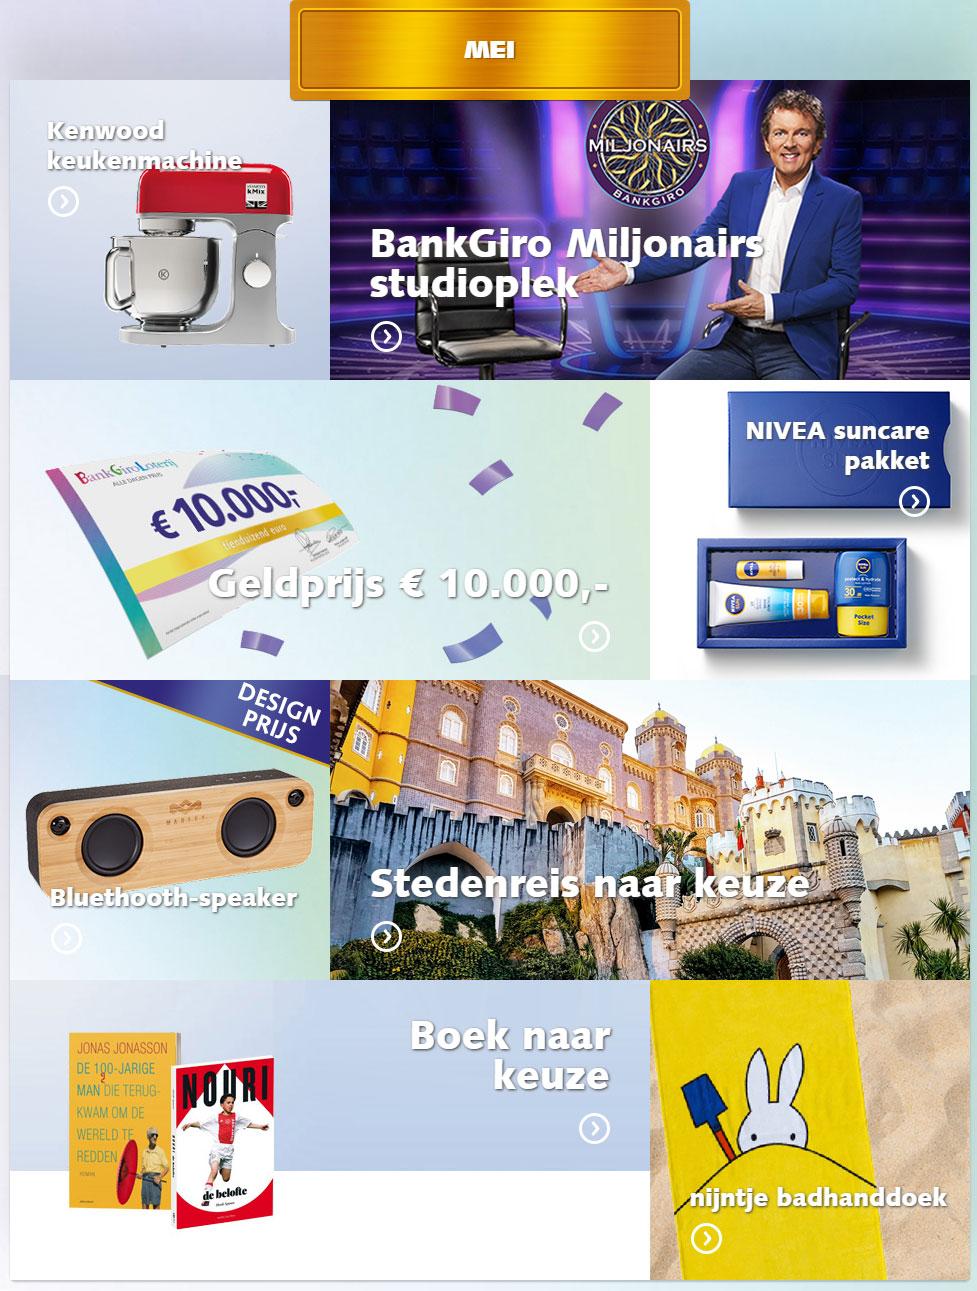 bankgiro loterij prijzen mei 2019